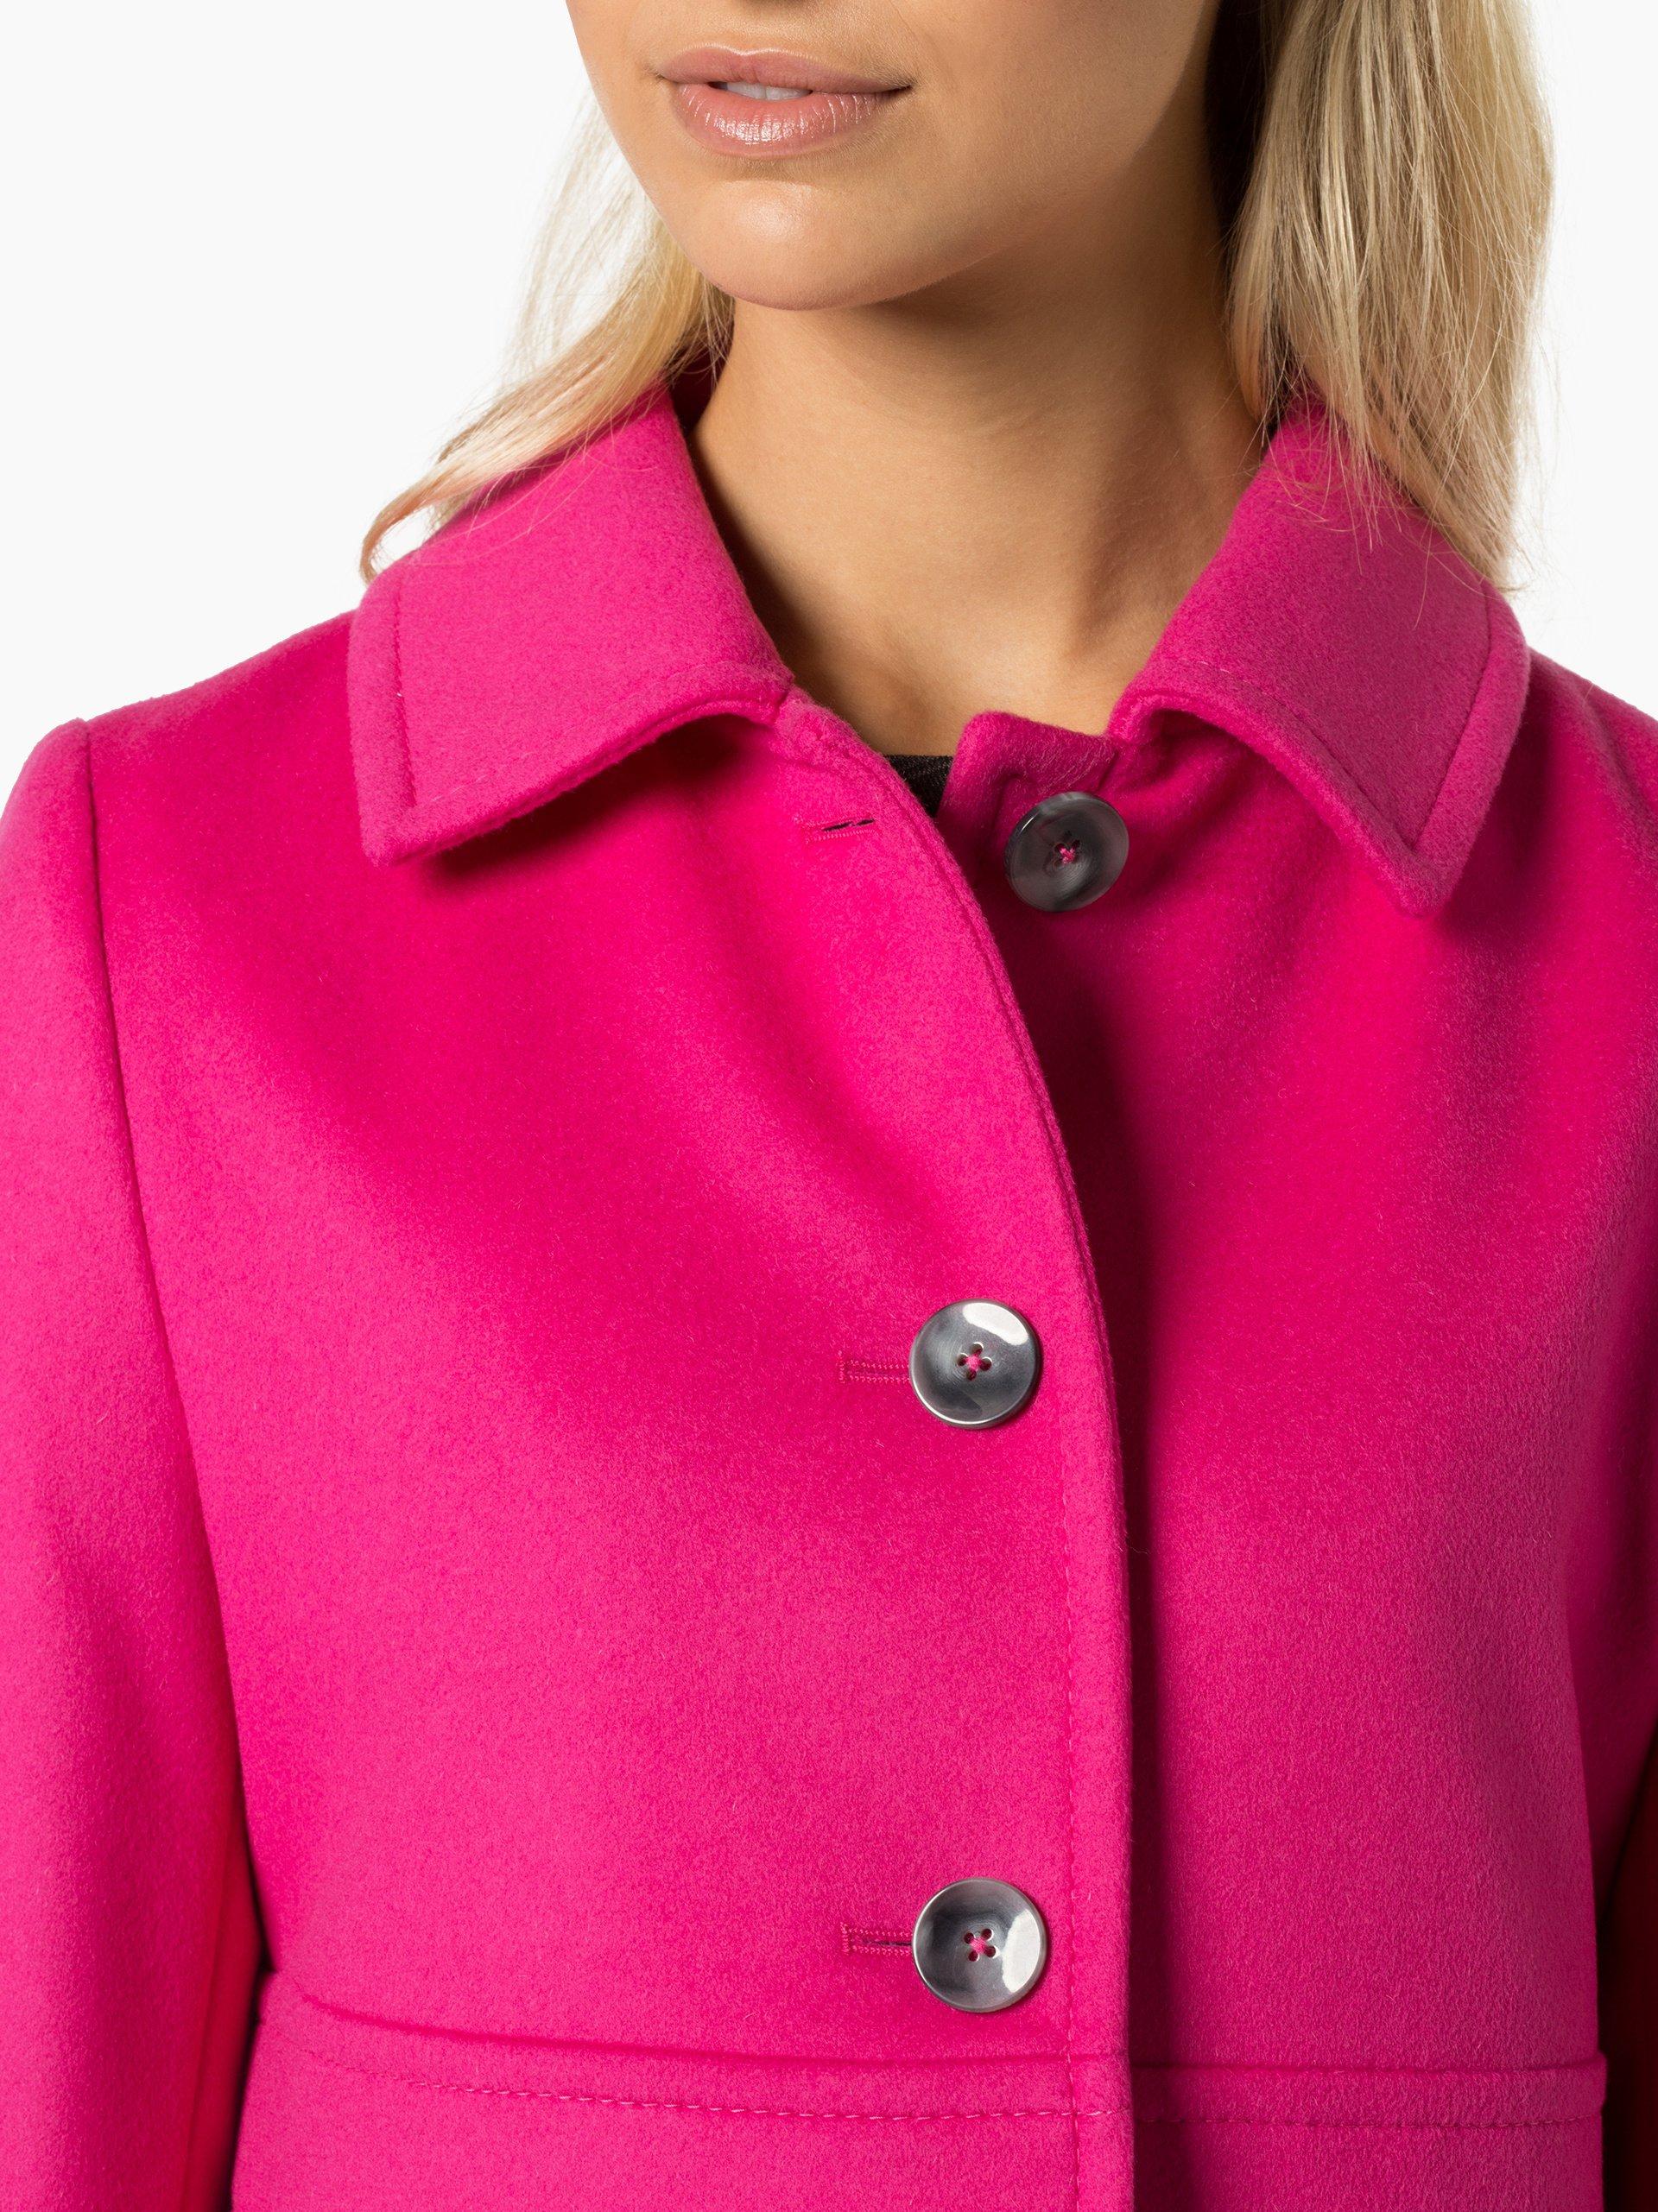 77030b1a8fb078 BOSS Casual Damen Mantel - Ohjules online kaufen